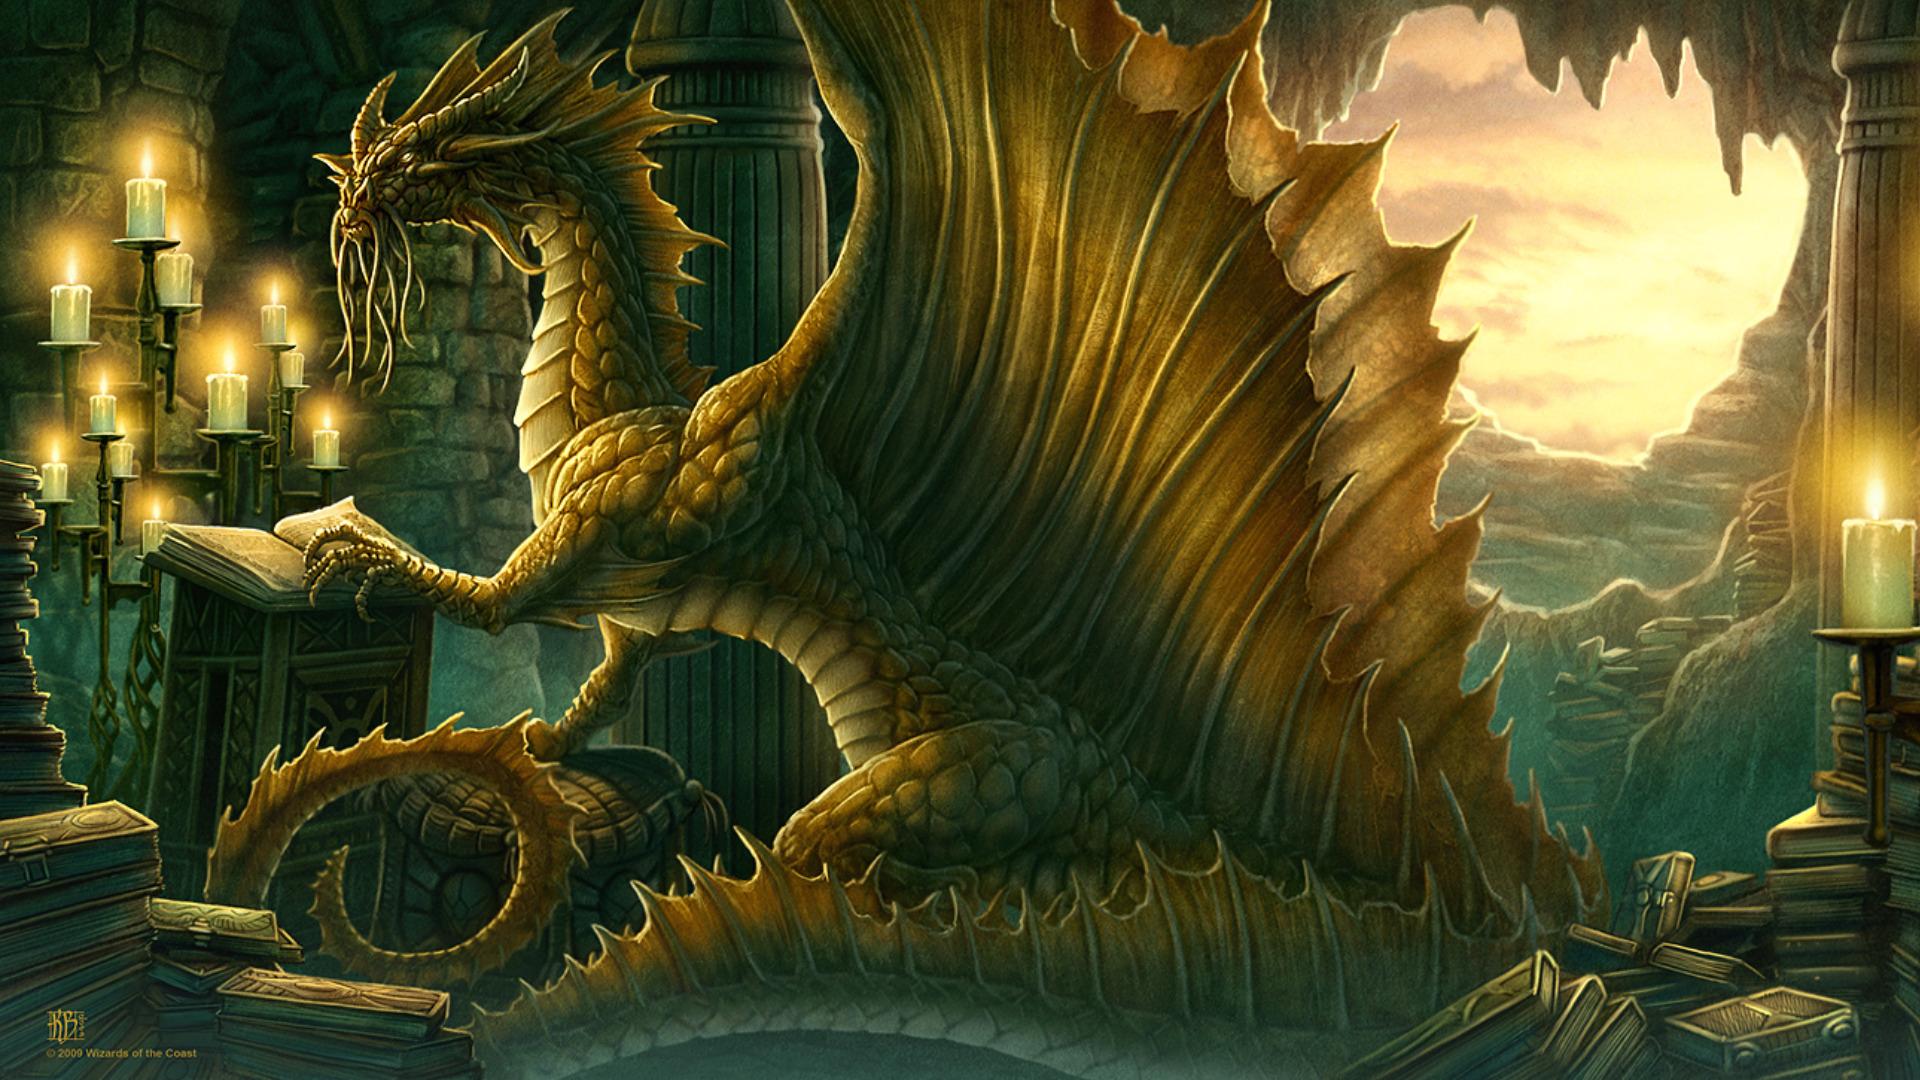 Cool Iphone Wallpaper Ideas Dragon Hd Wallpaper Background Image 1920x1080 Id